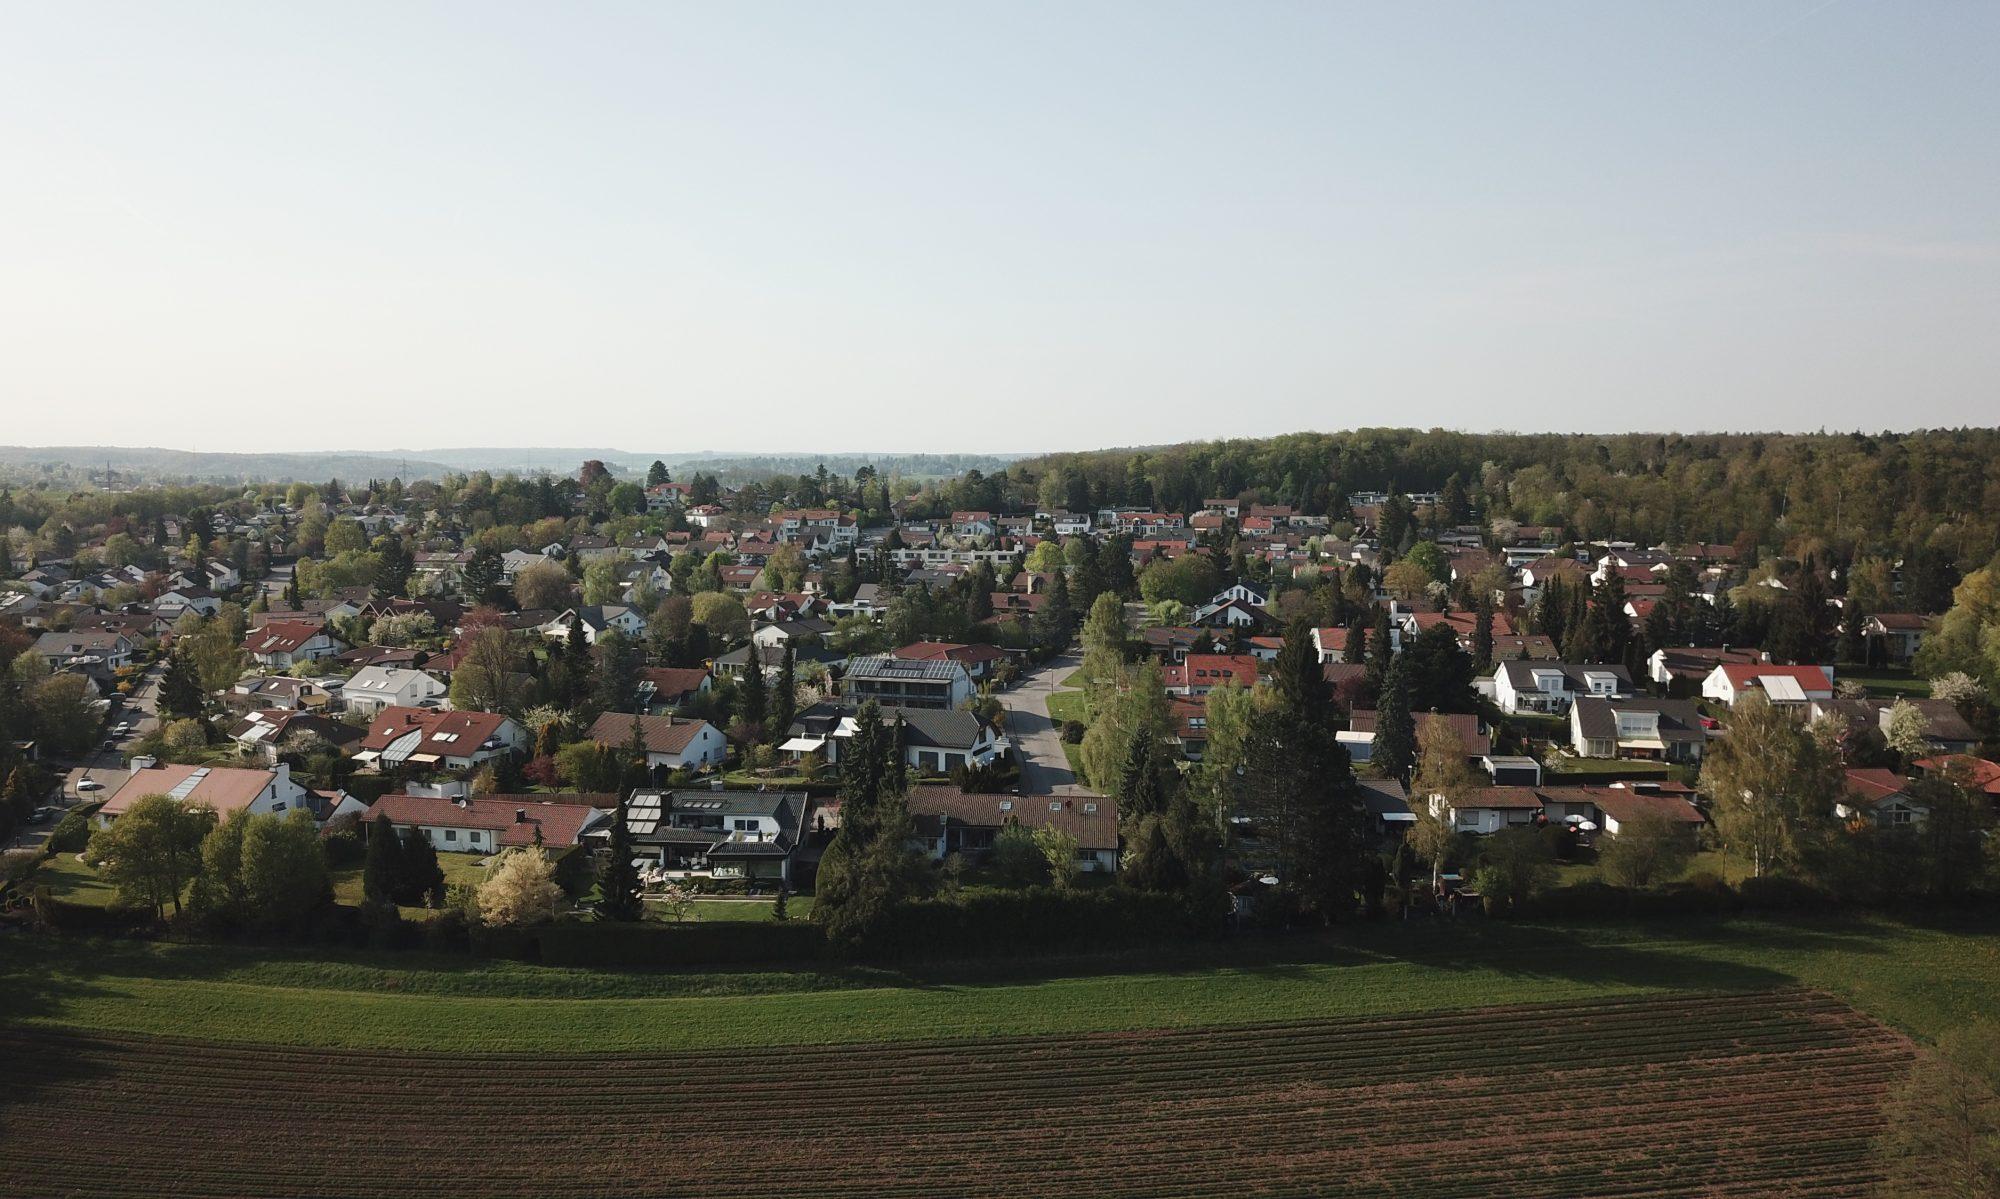 Bürgerverein Landhaussiedlung Maichingen e.V.